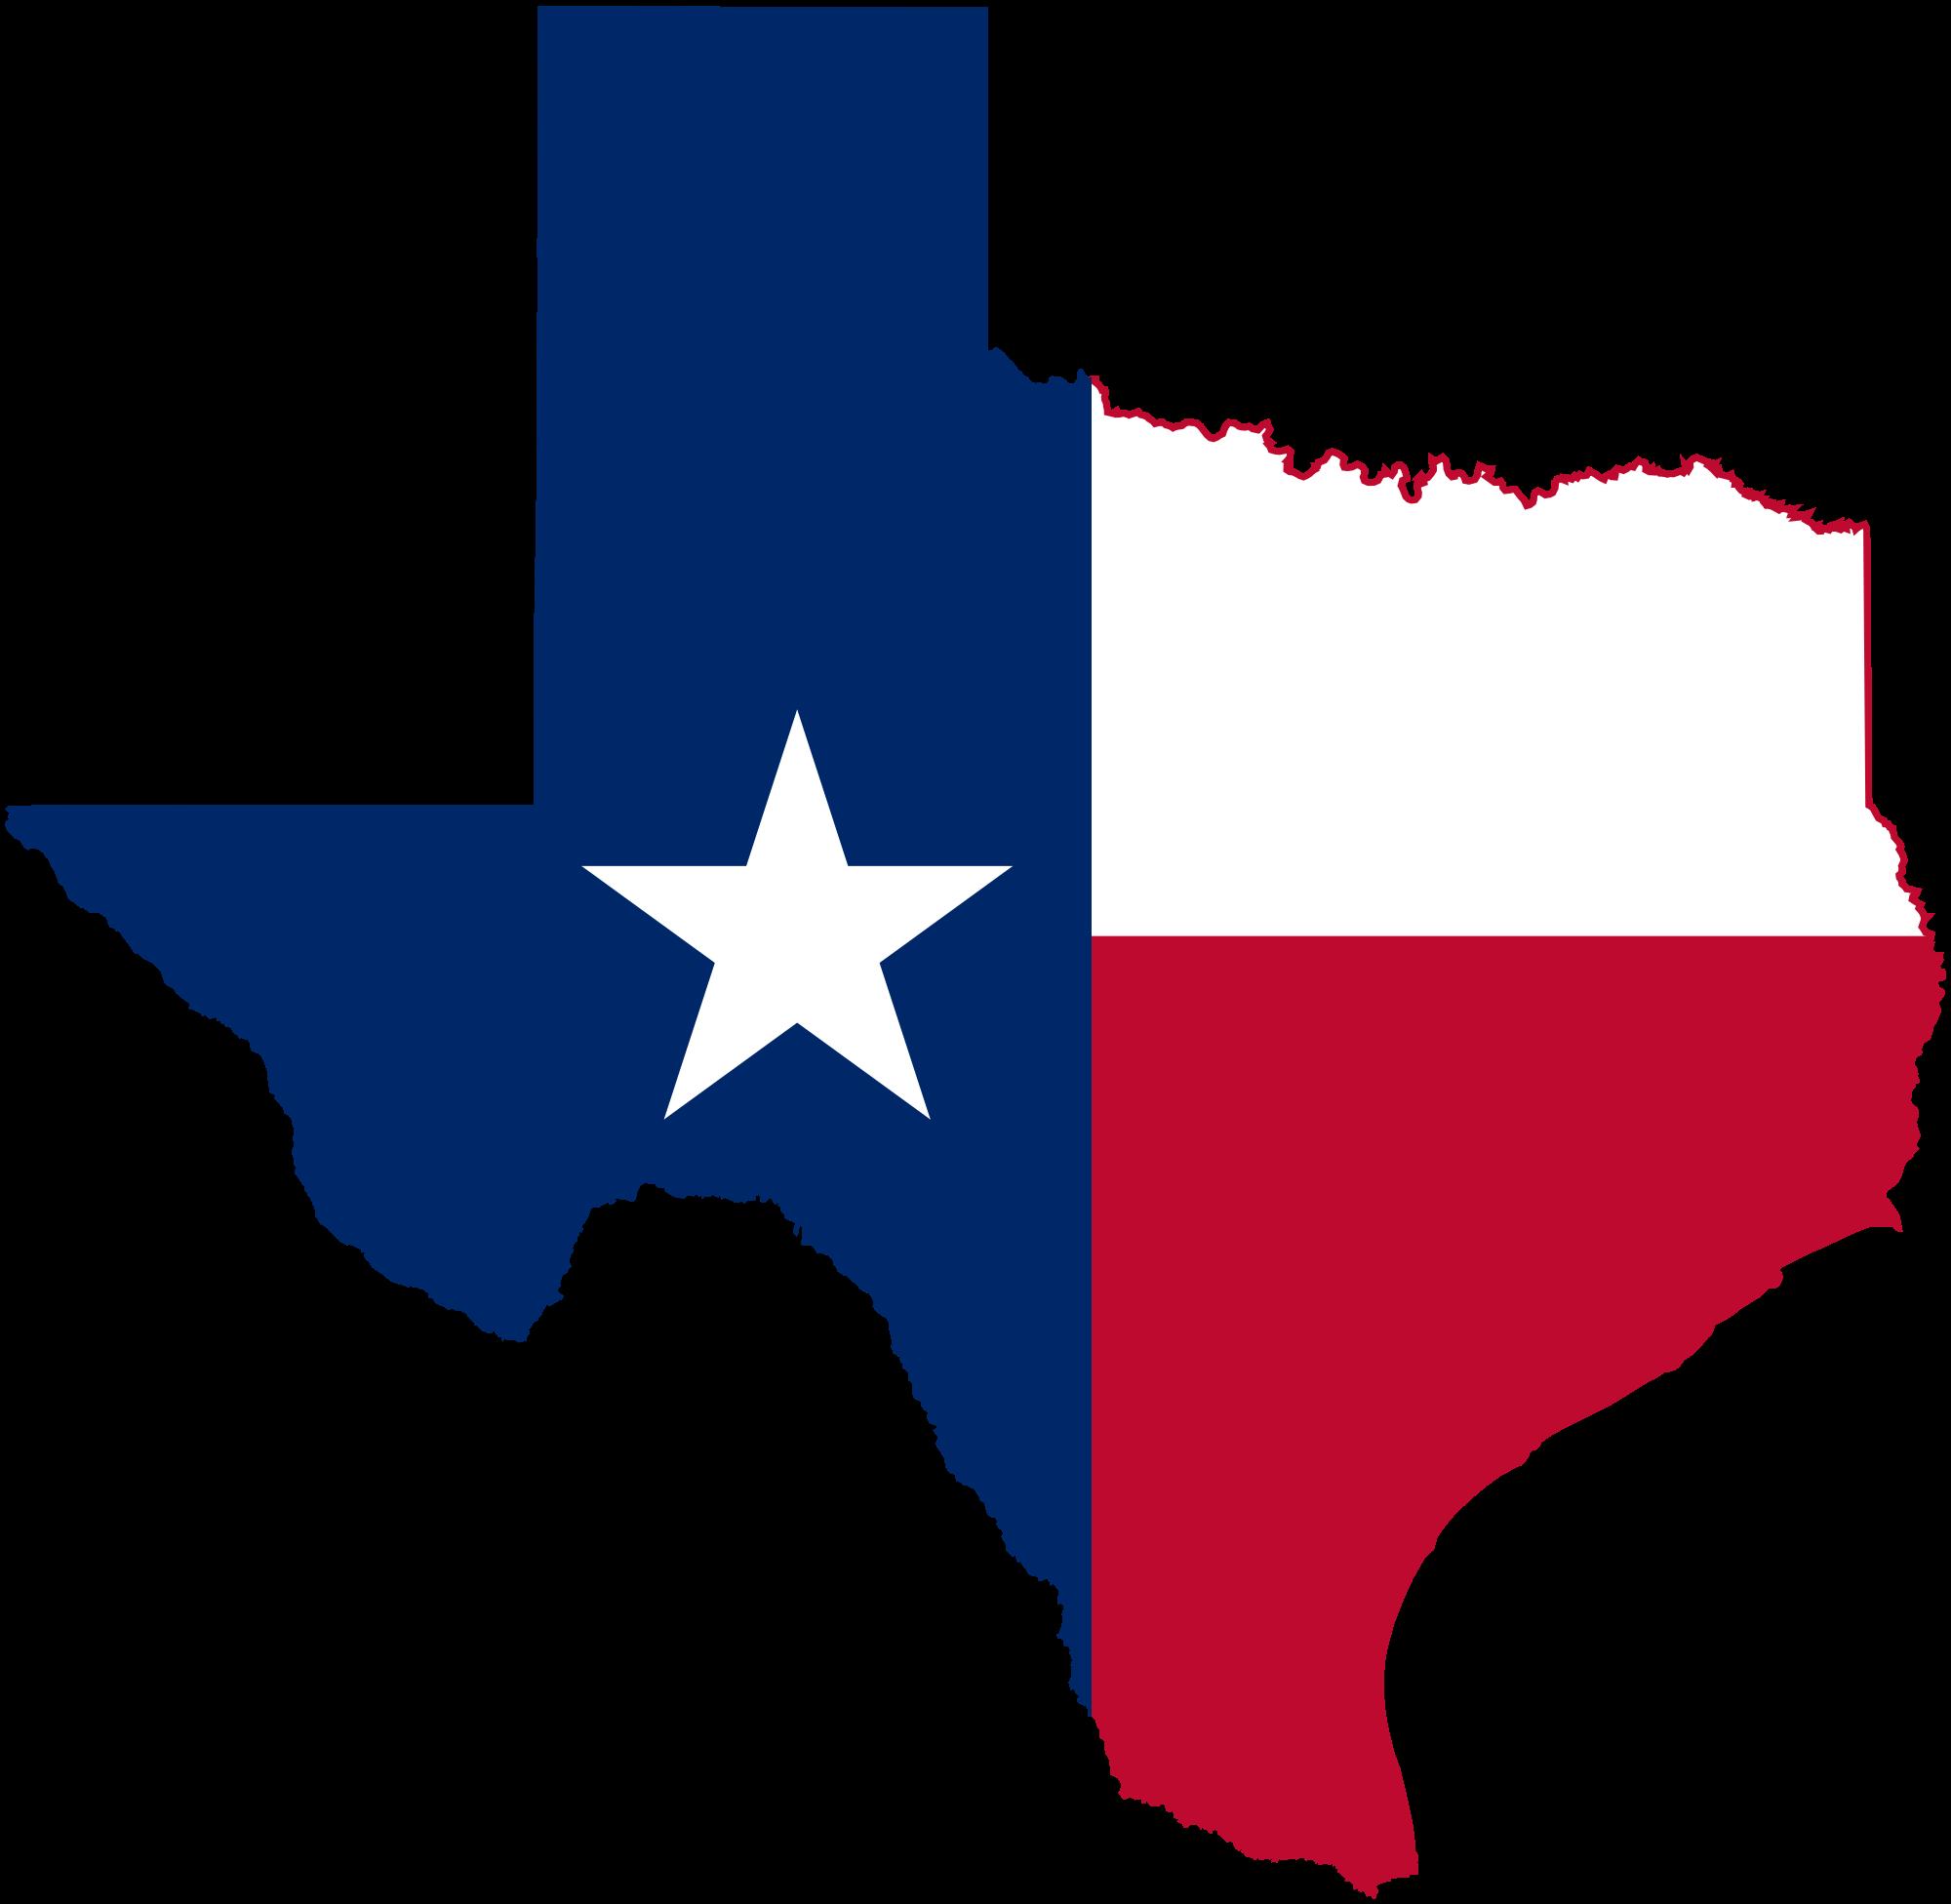 Why texans are so. Hurricane clipart hurricane katrina